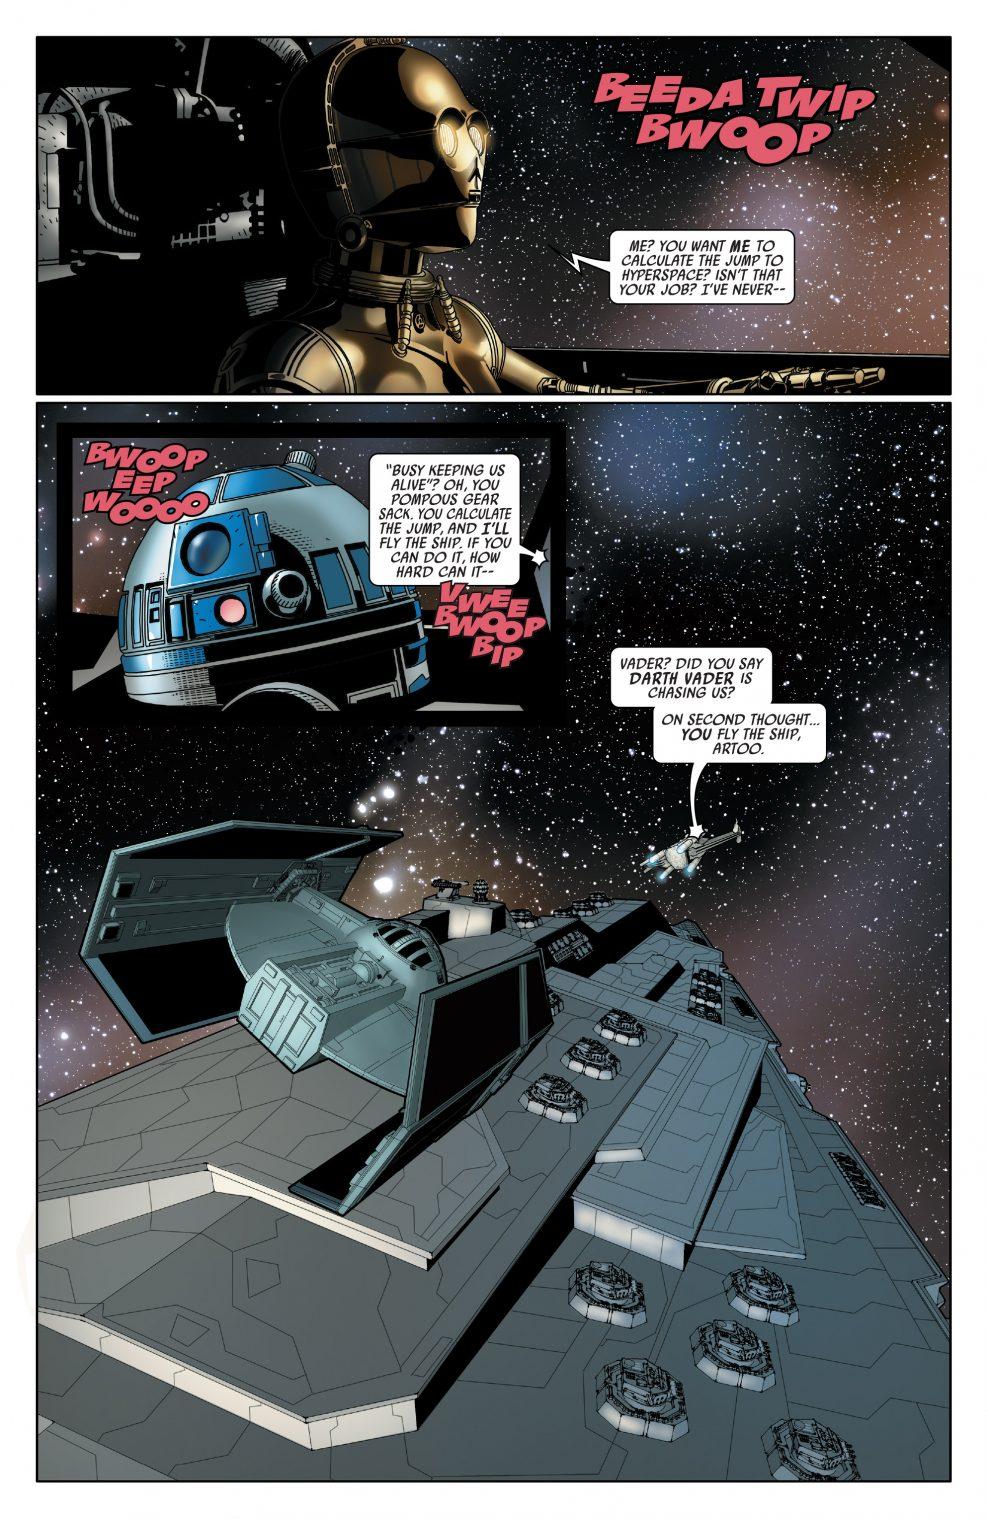 R2-D2 Flies Against Darth Vader